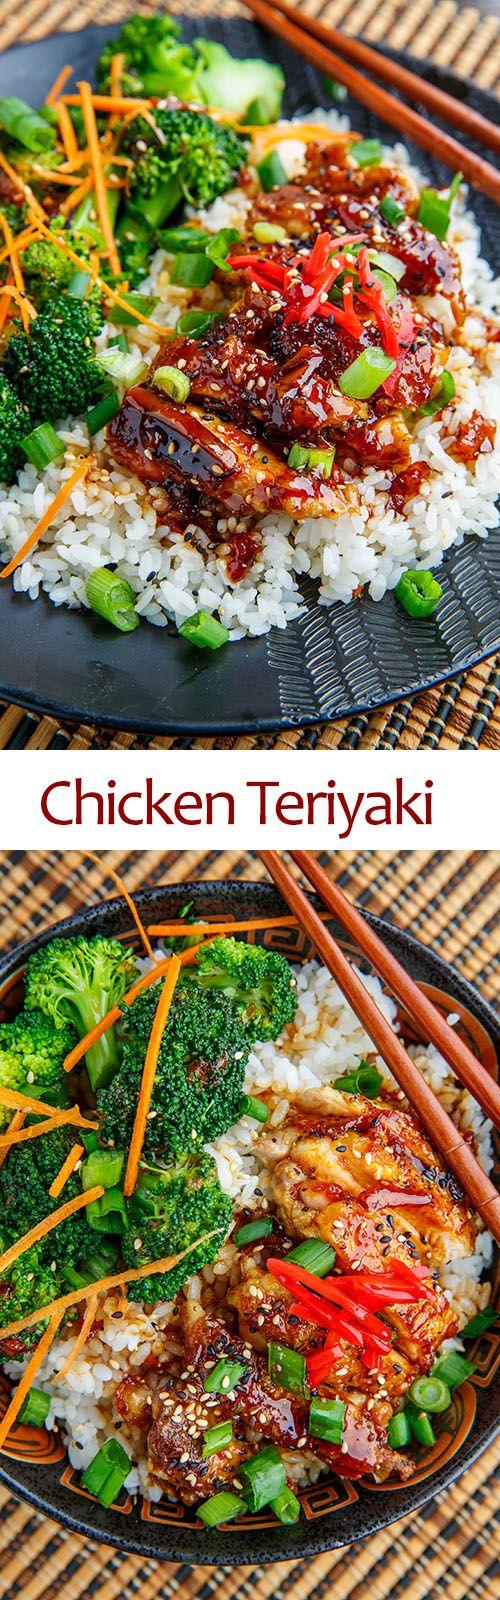 Chicken Teriyaki | Closet Cooking